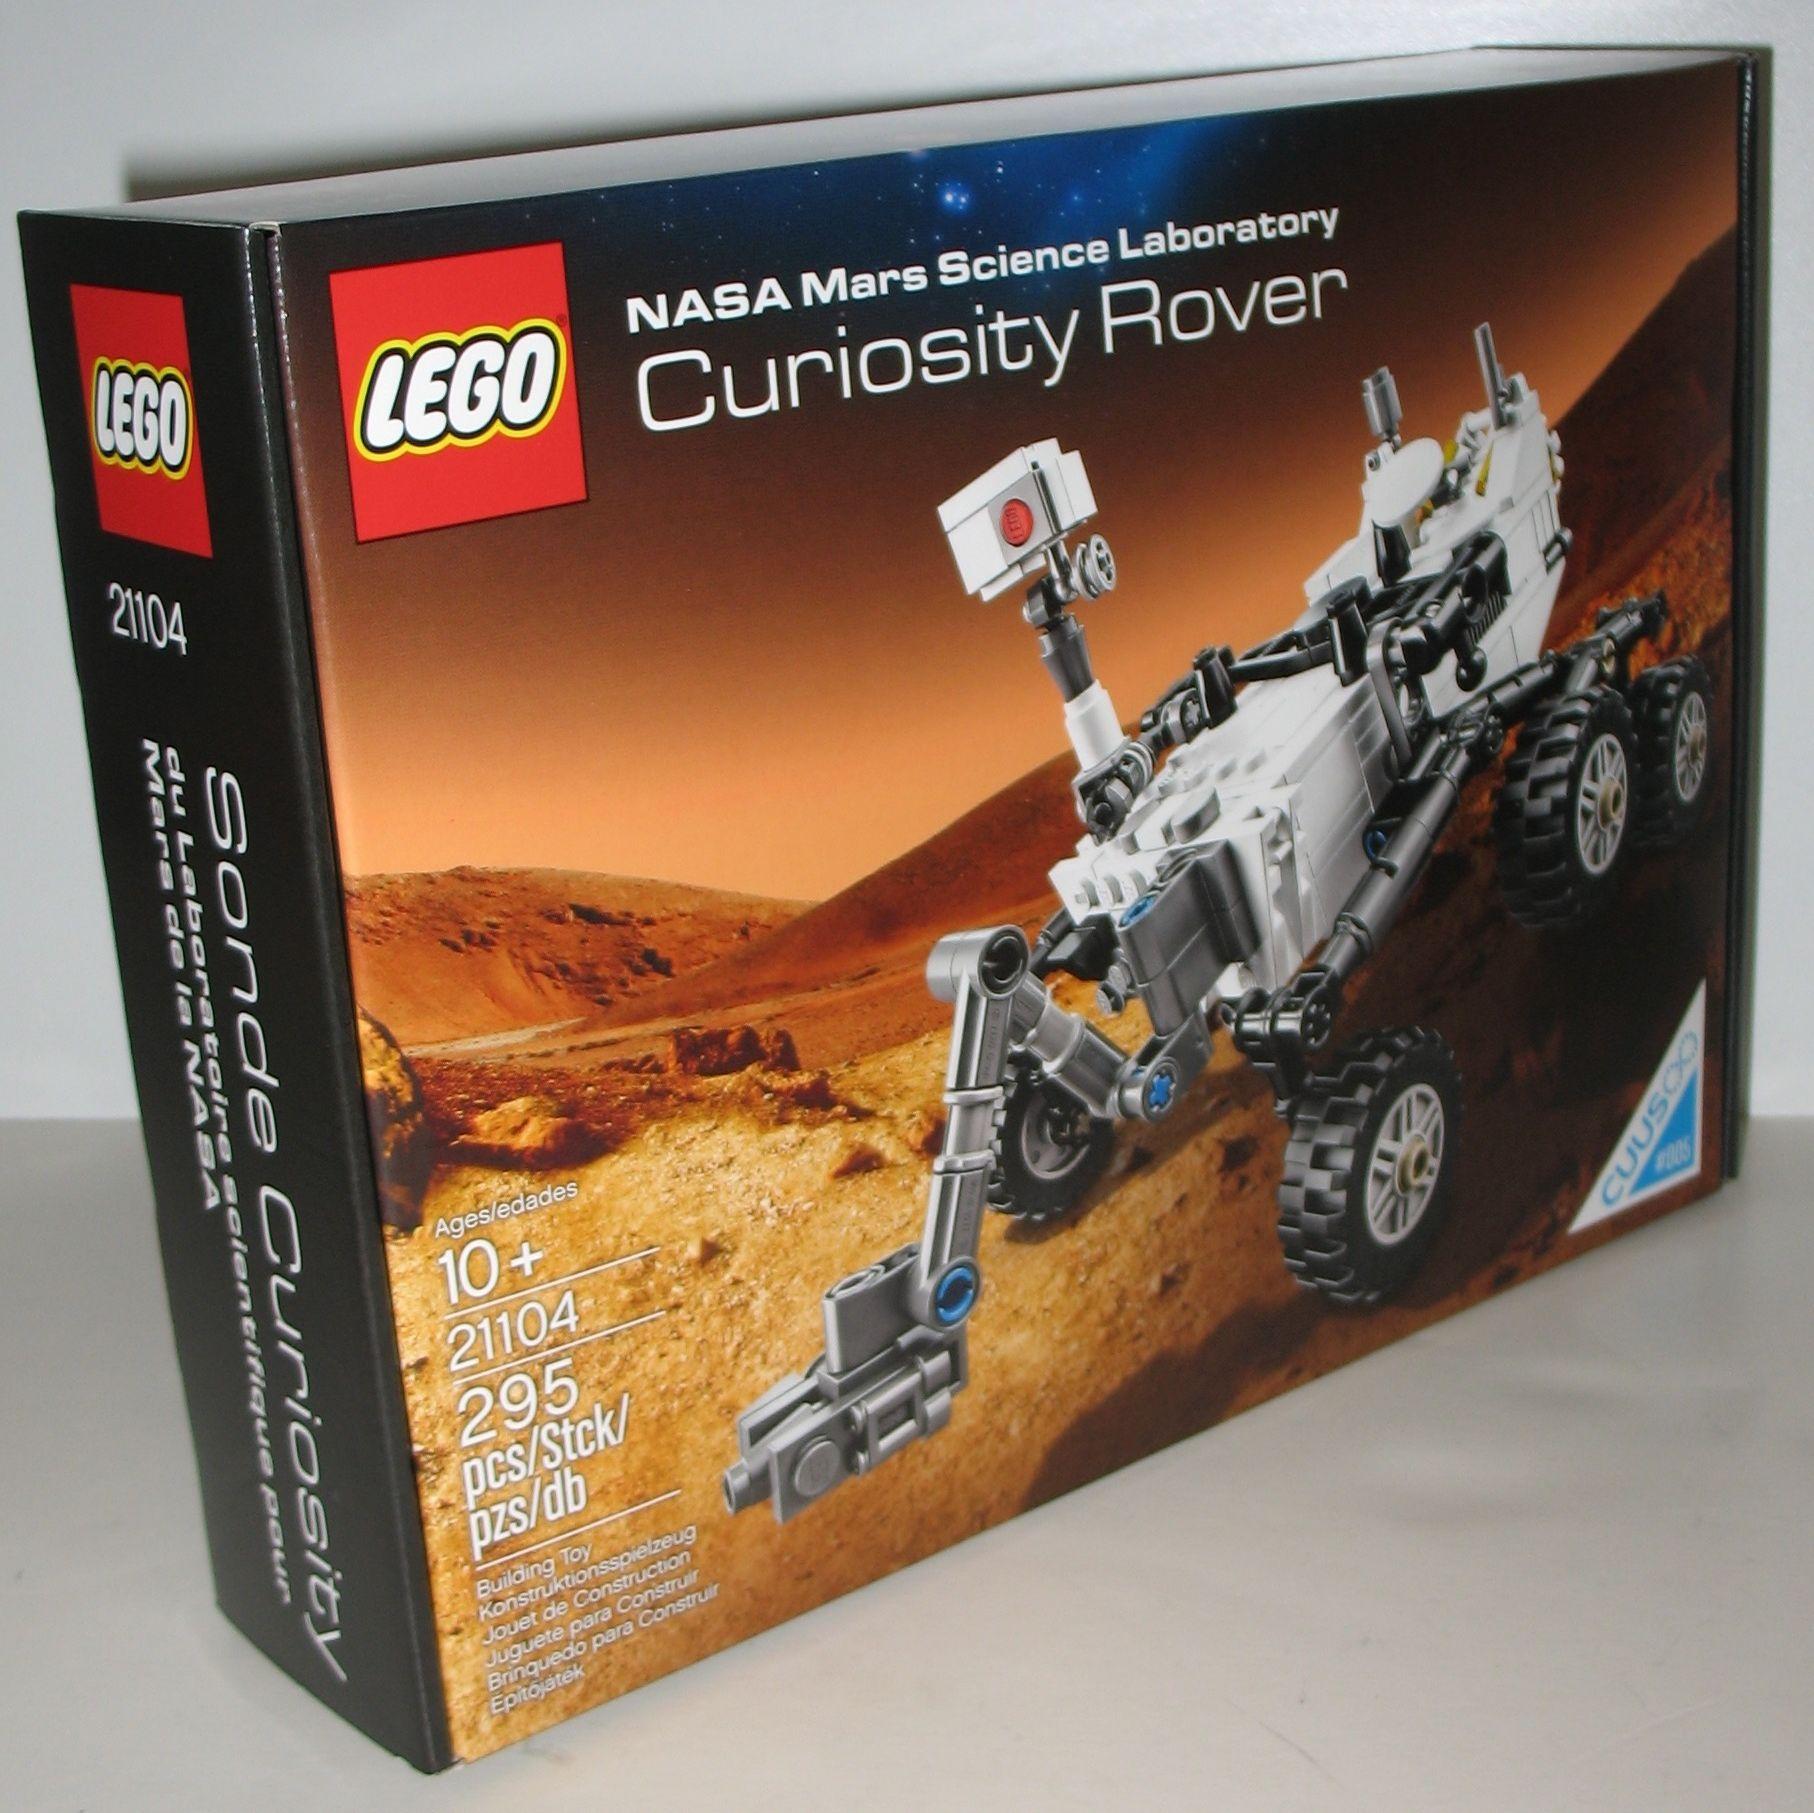 LEGO CUUSOO Nasa Mars Science Laboratory Curiosity Rover 21104. #lego #cuusoo #ck